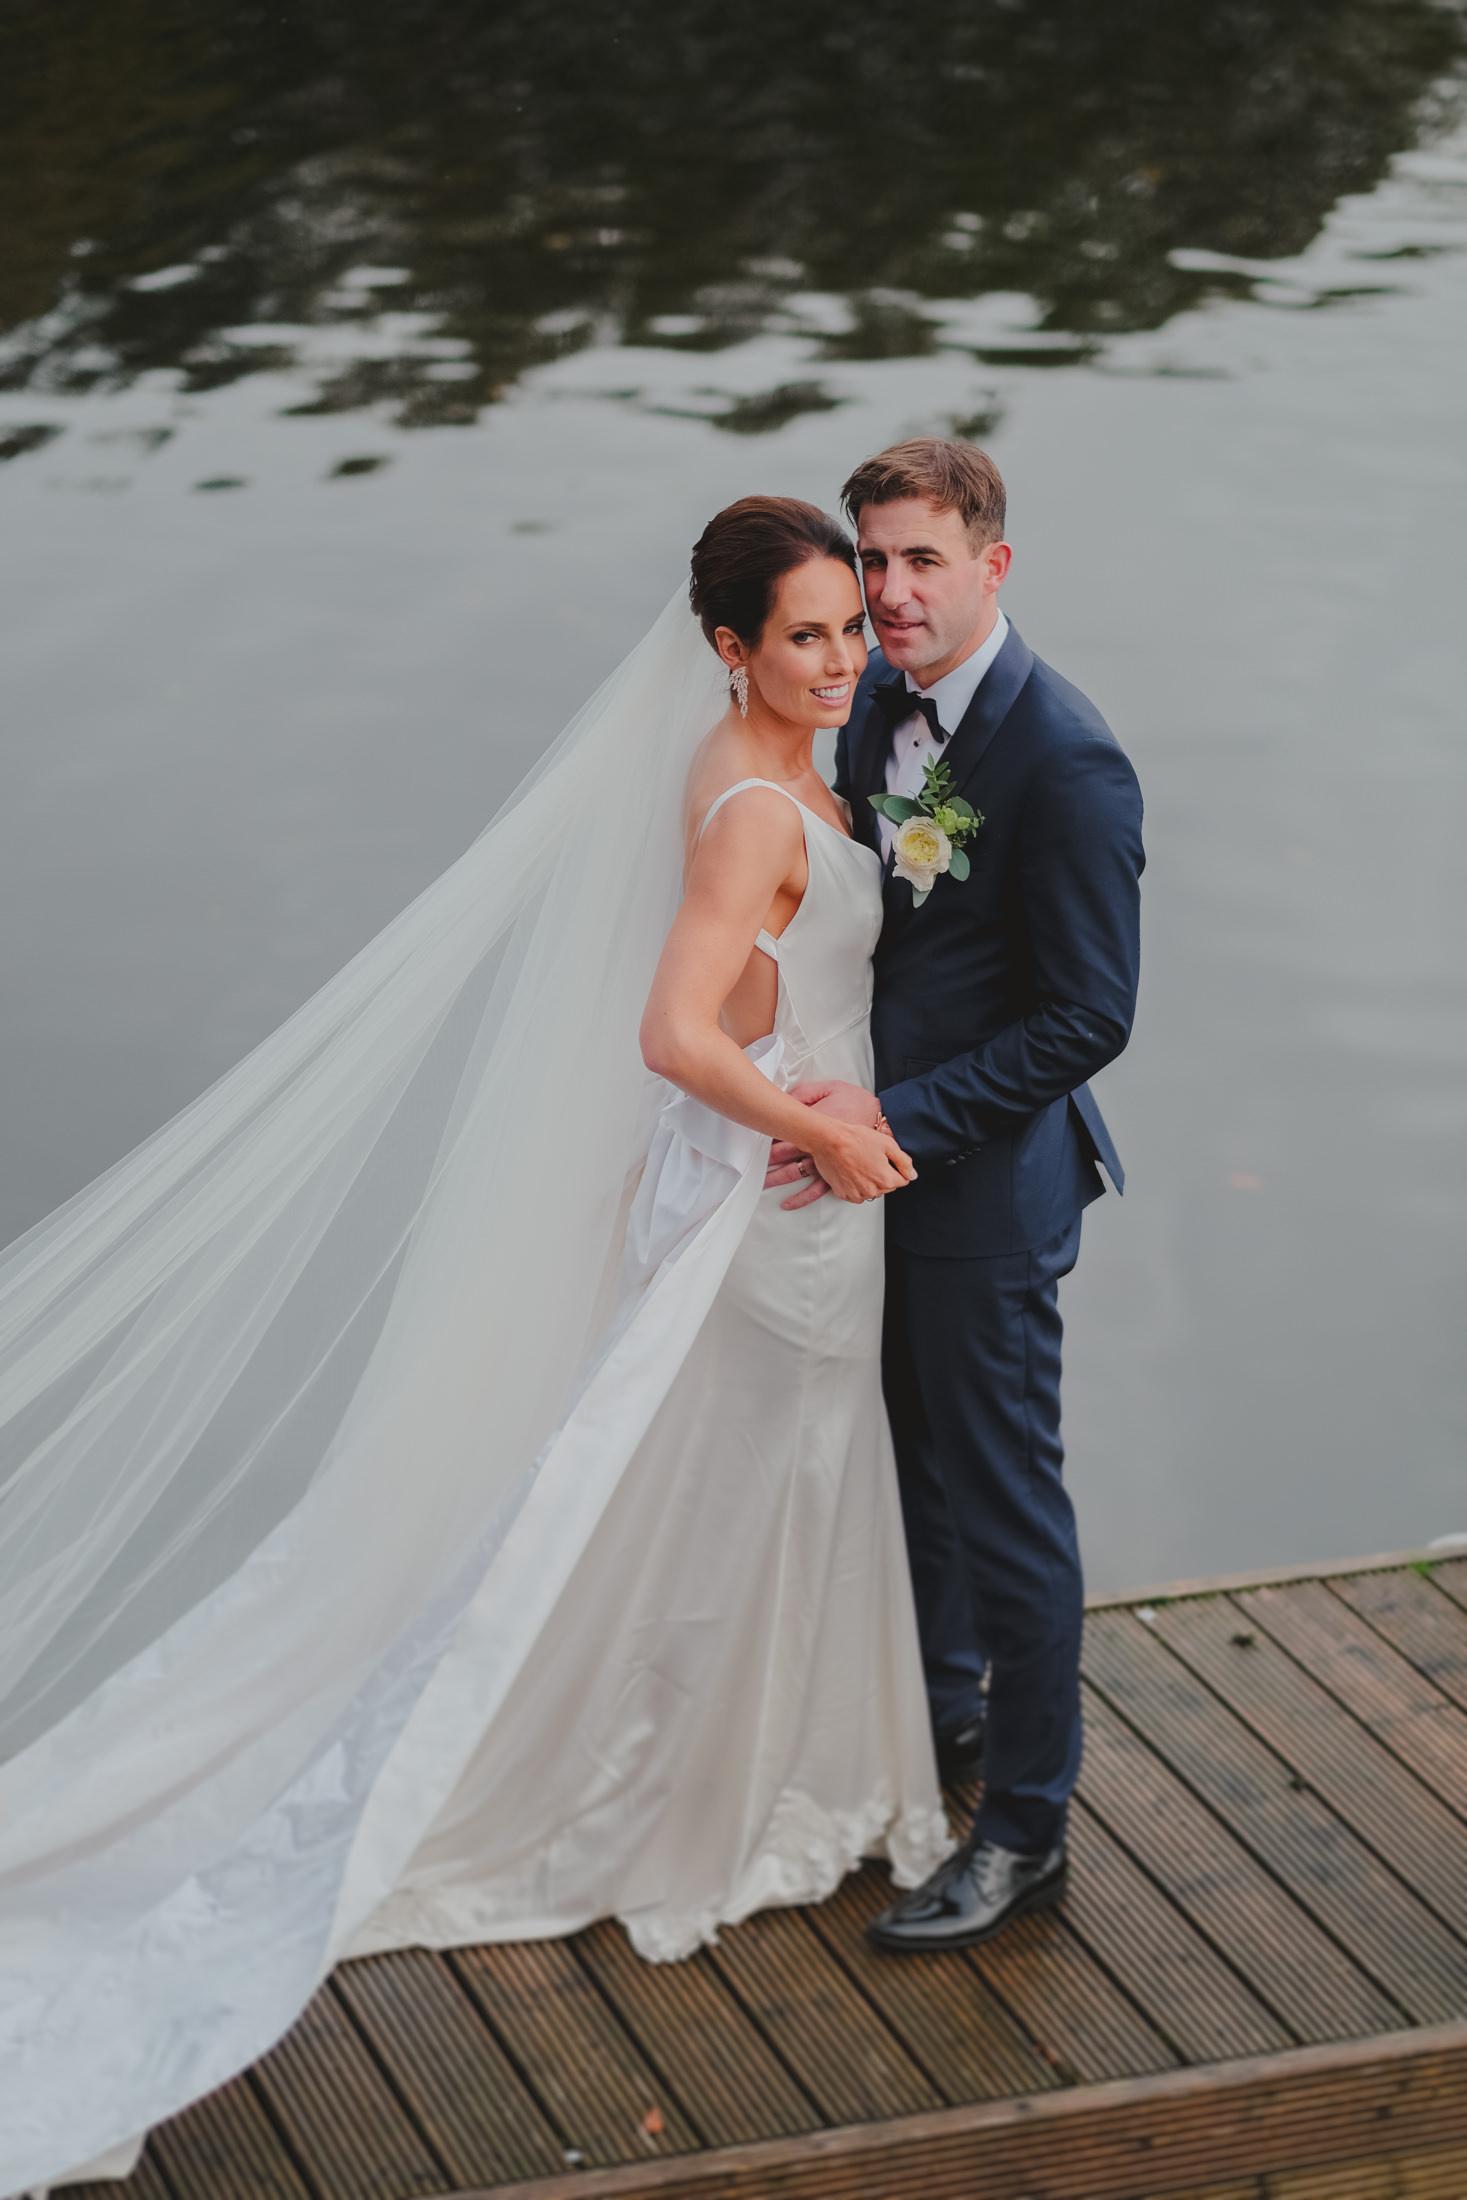 Aoibheann McCaul wedding 10